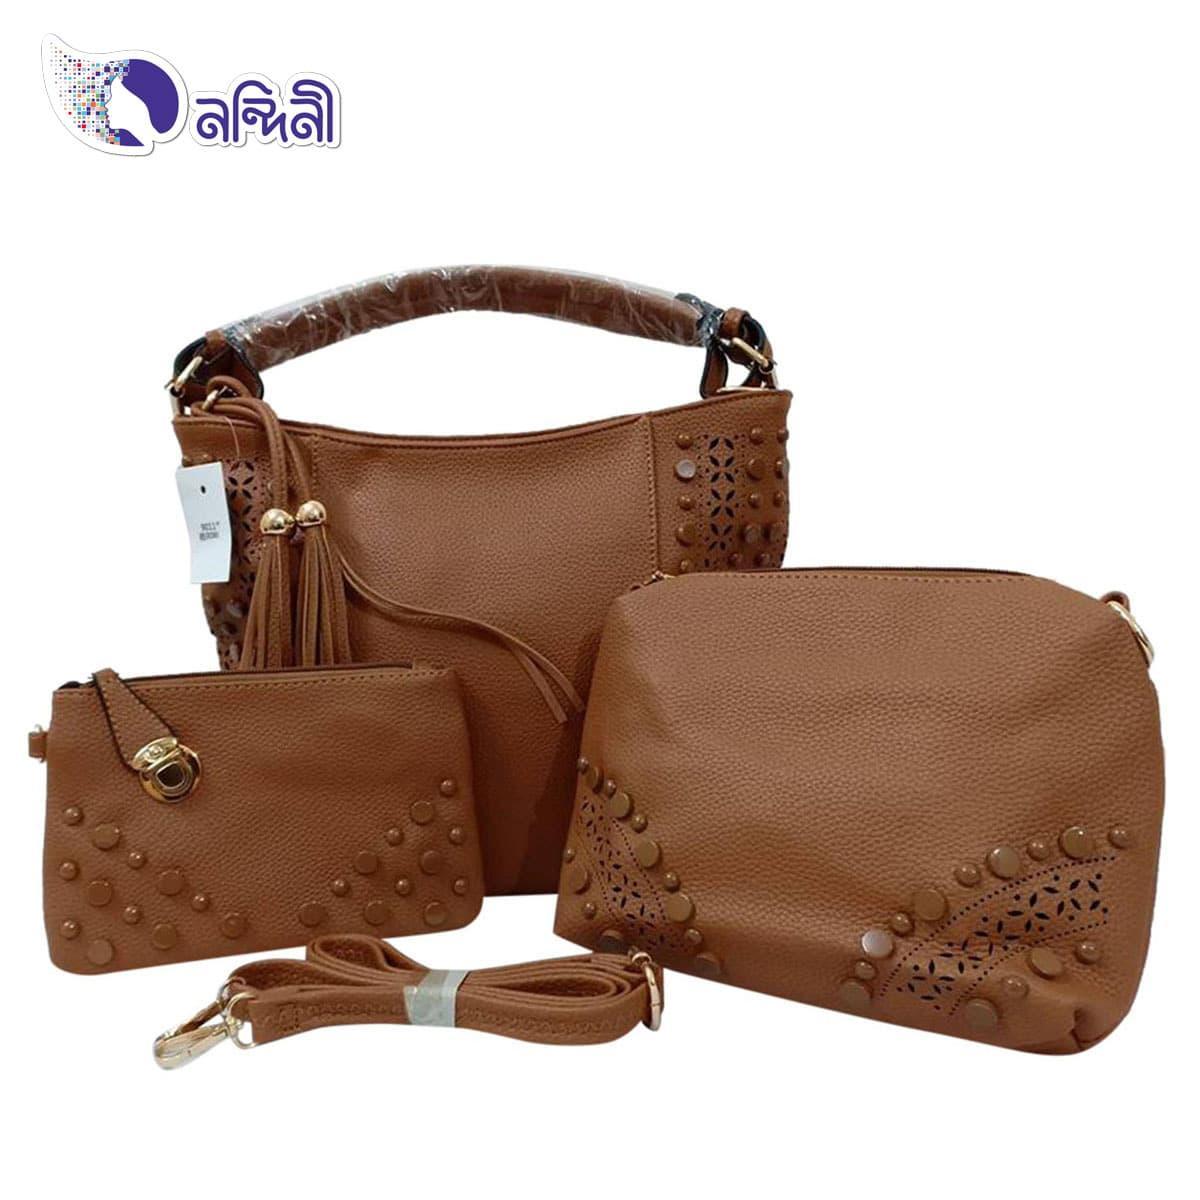 Ladies Handbags   Women s Handbags In Bangladesh At Best Price ... a77eb2f05ce0b